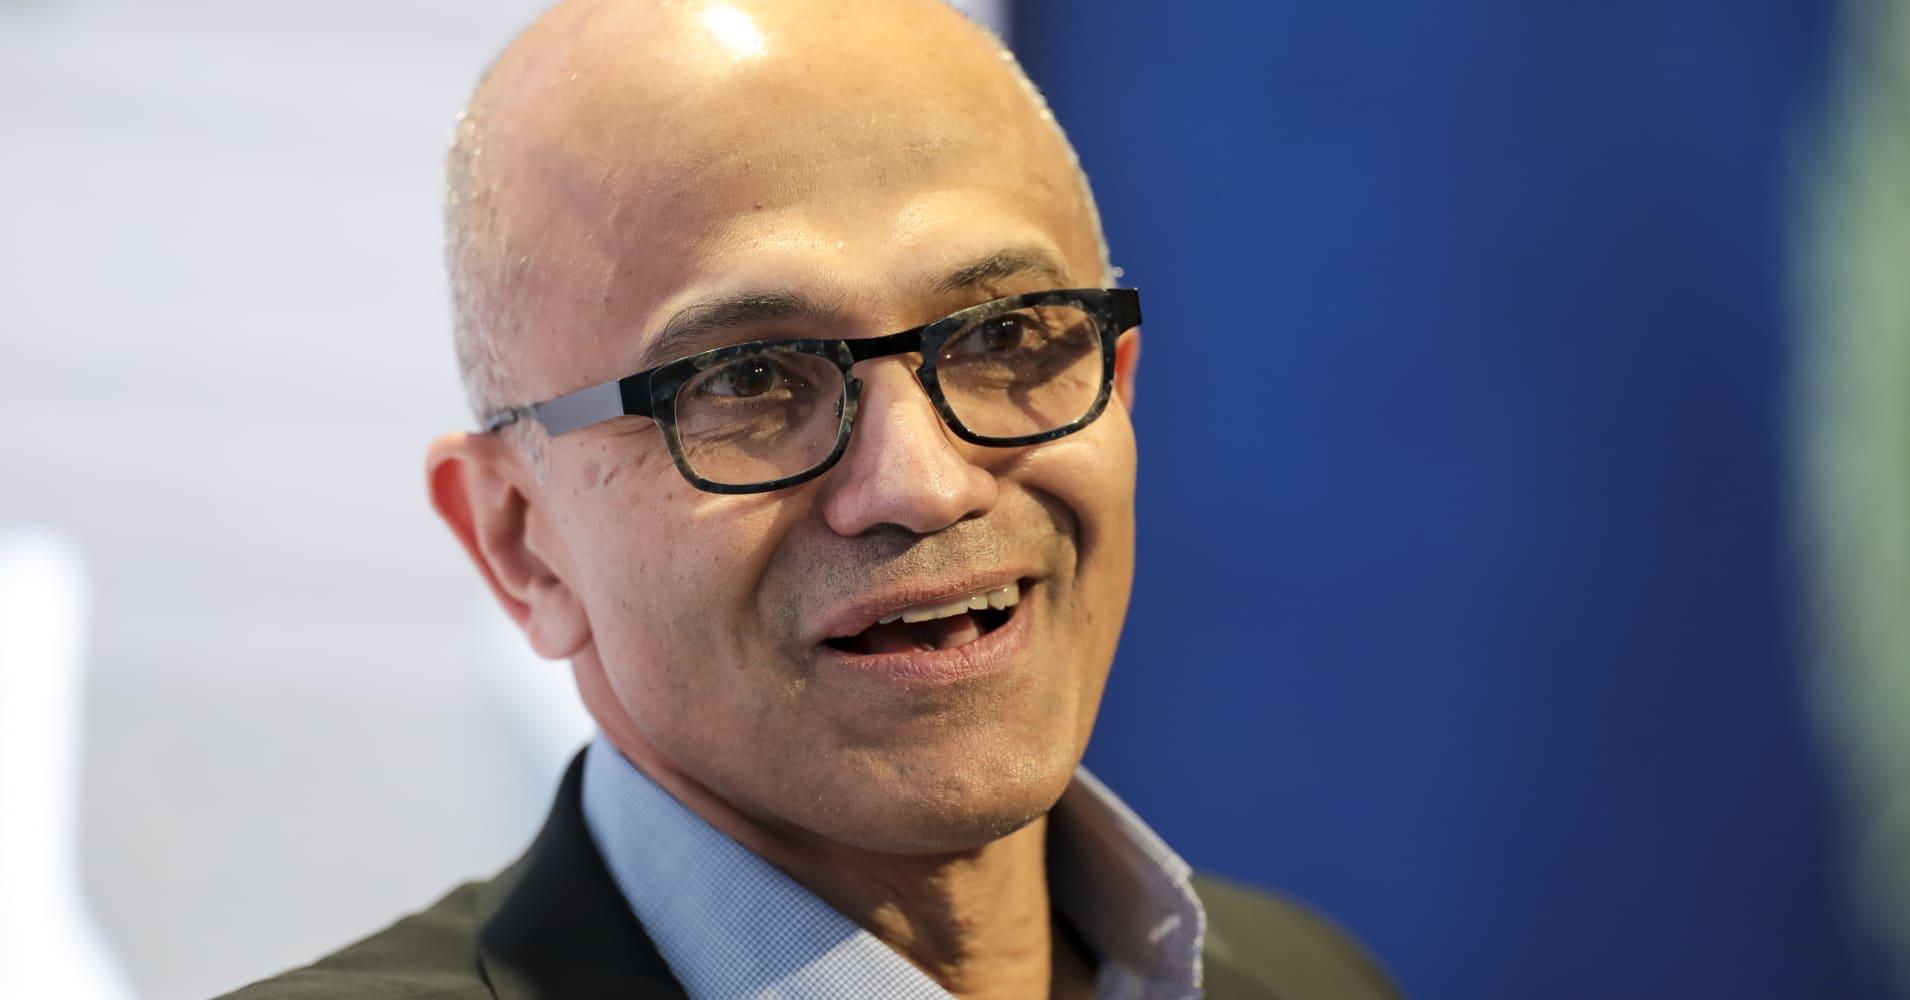 Davos: Microsoft's Nadella says facial recognition needs regulation